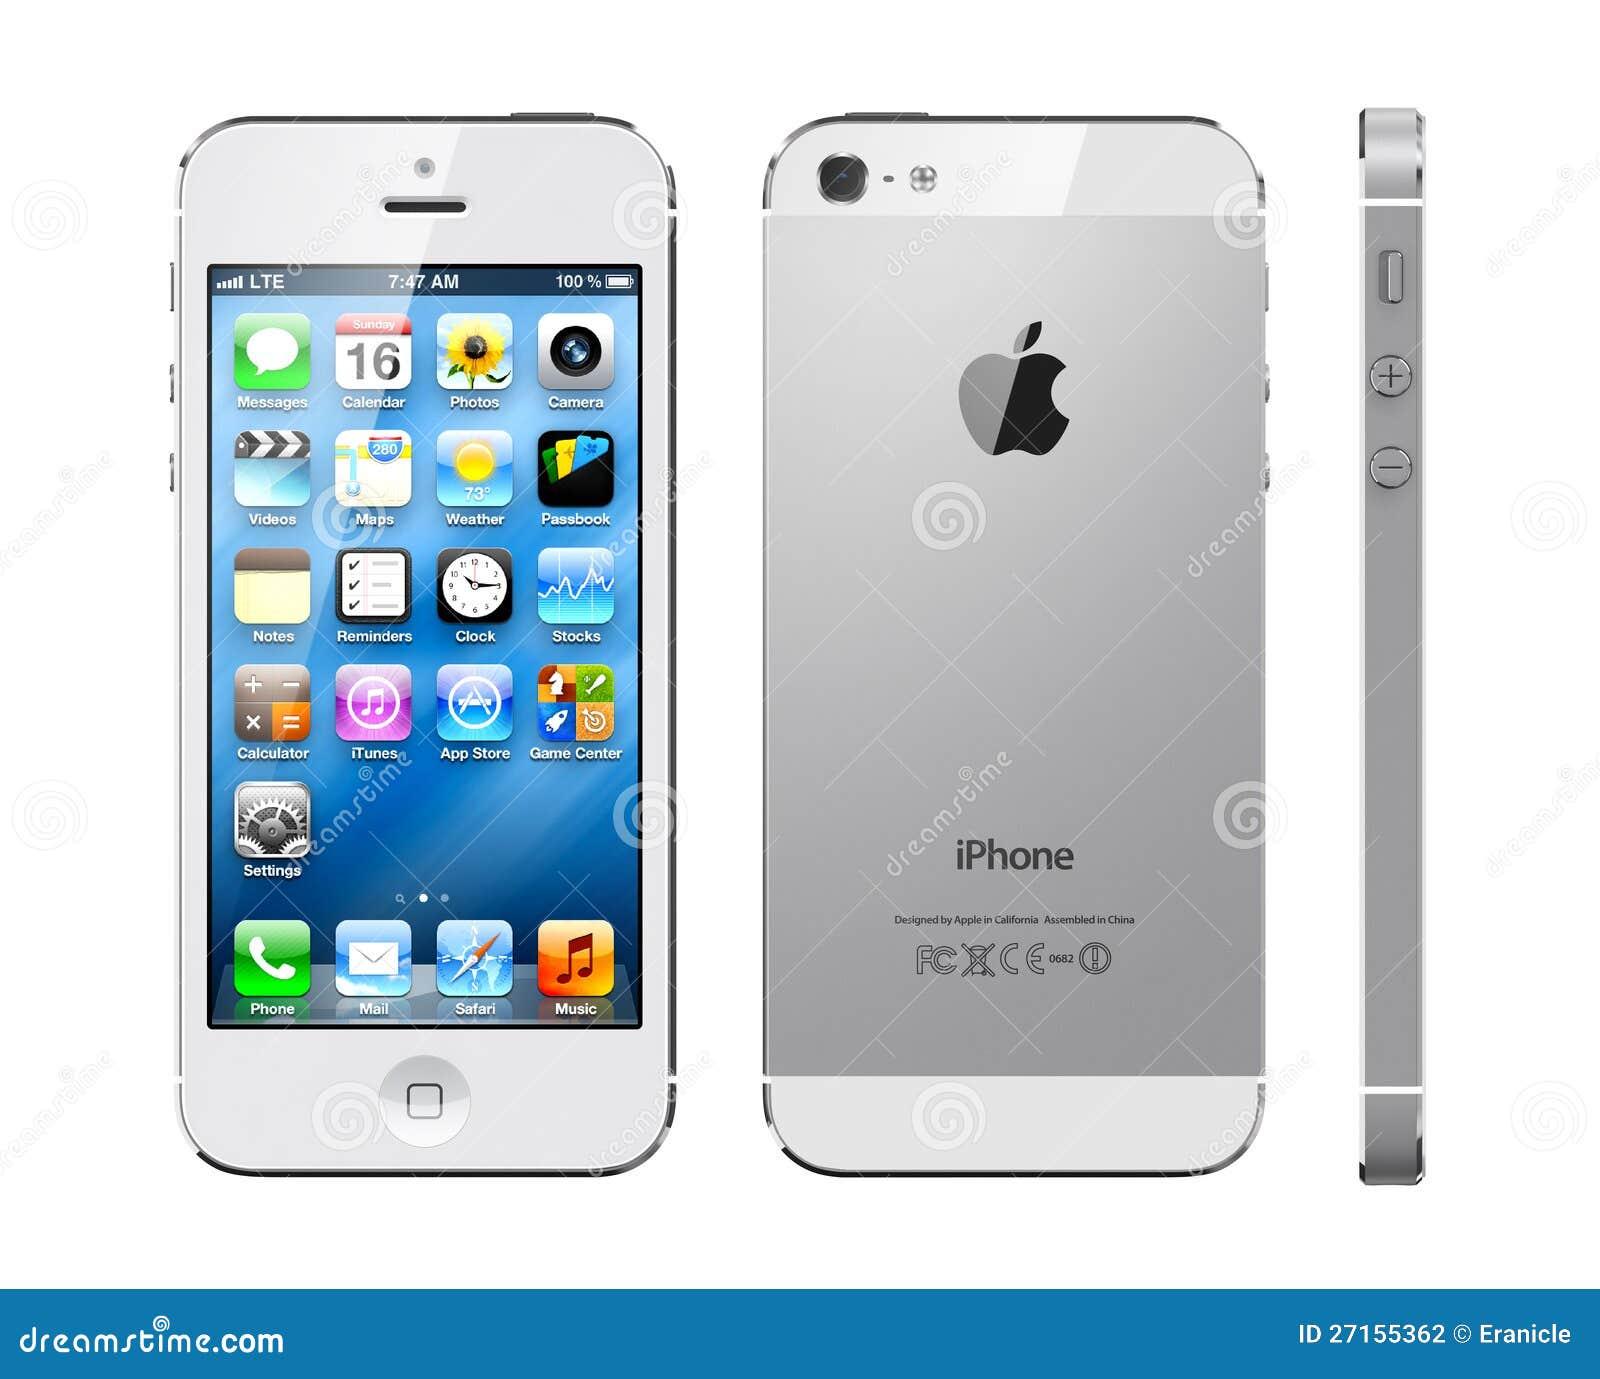 apple iphone 5 wei redaktionelles stockfotografie bild. Black Bedroom Furniture Sets. Home Design Ideas